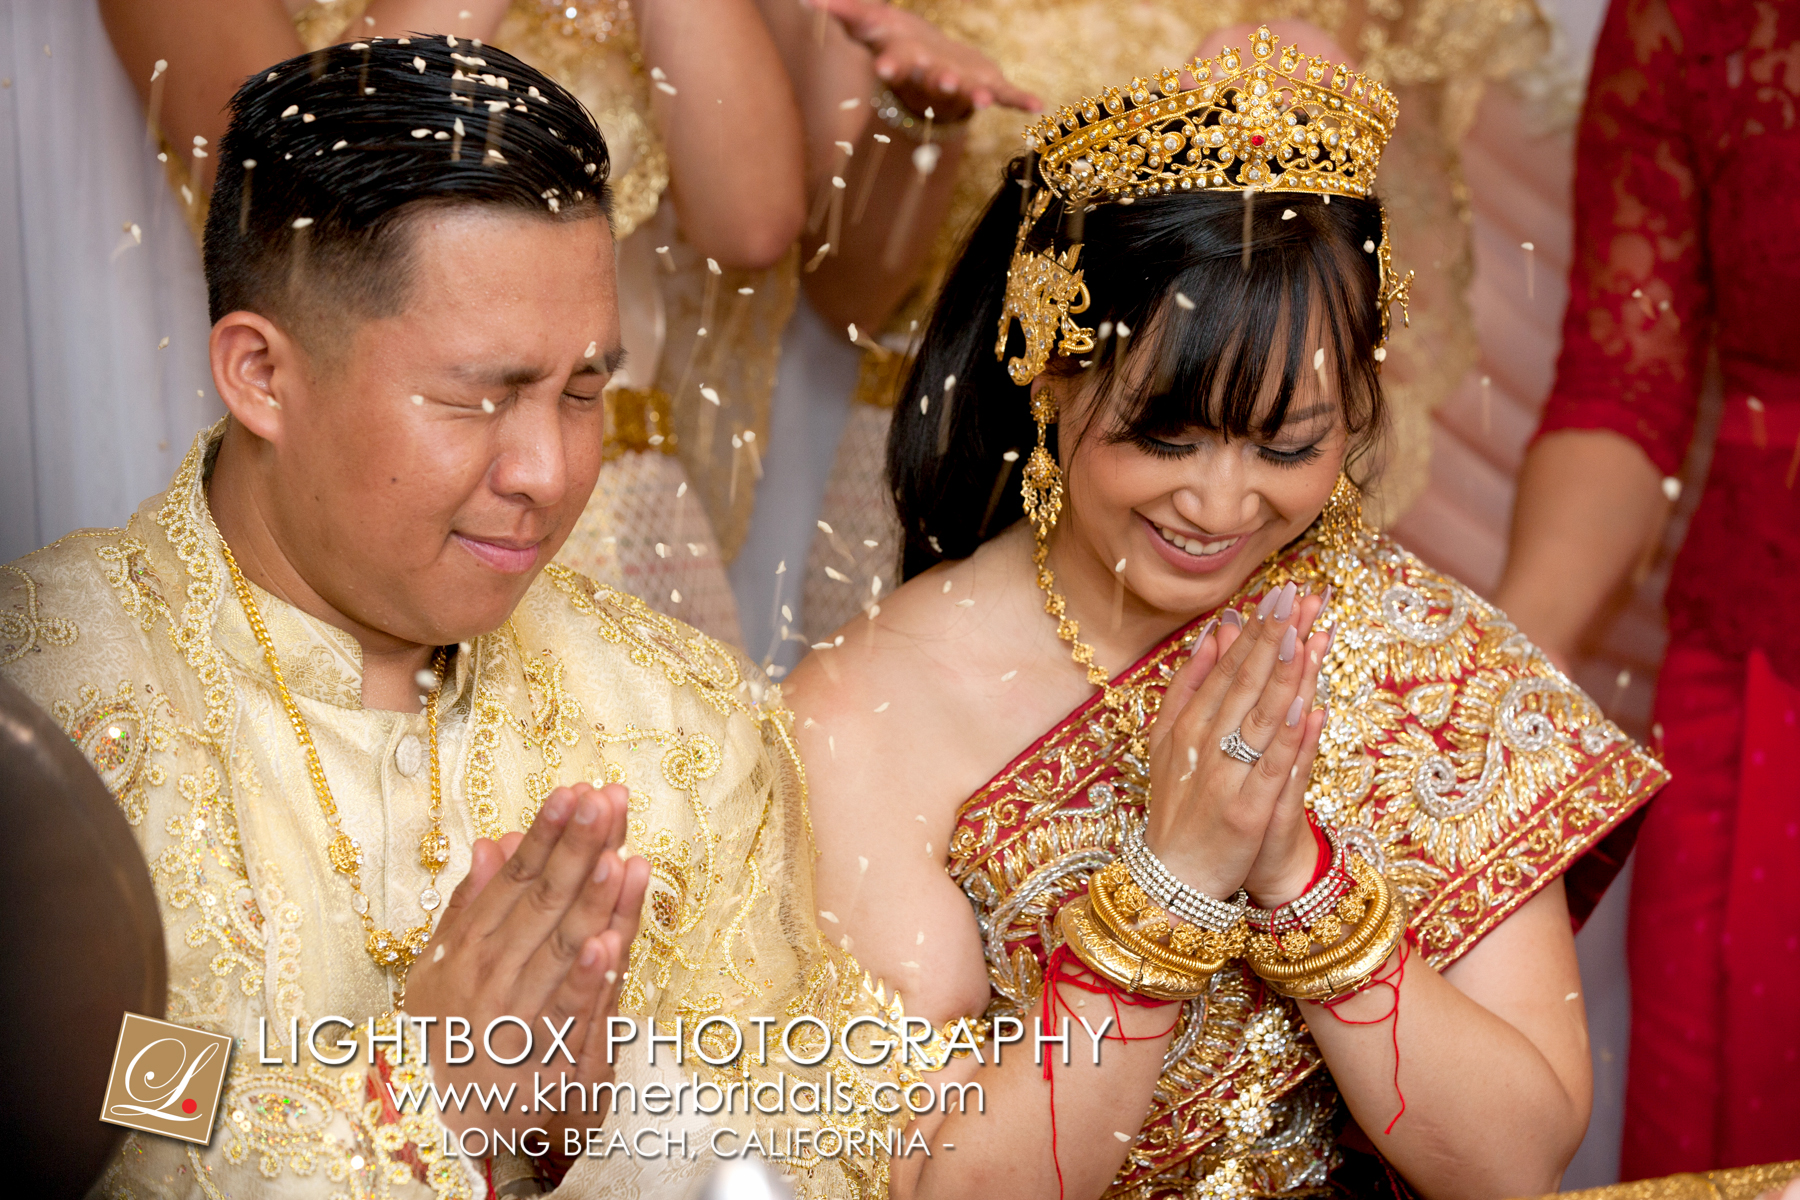 Khmer Bridal Wedding Photography video Apsara Studio Oufit-108.jpg